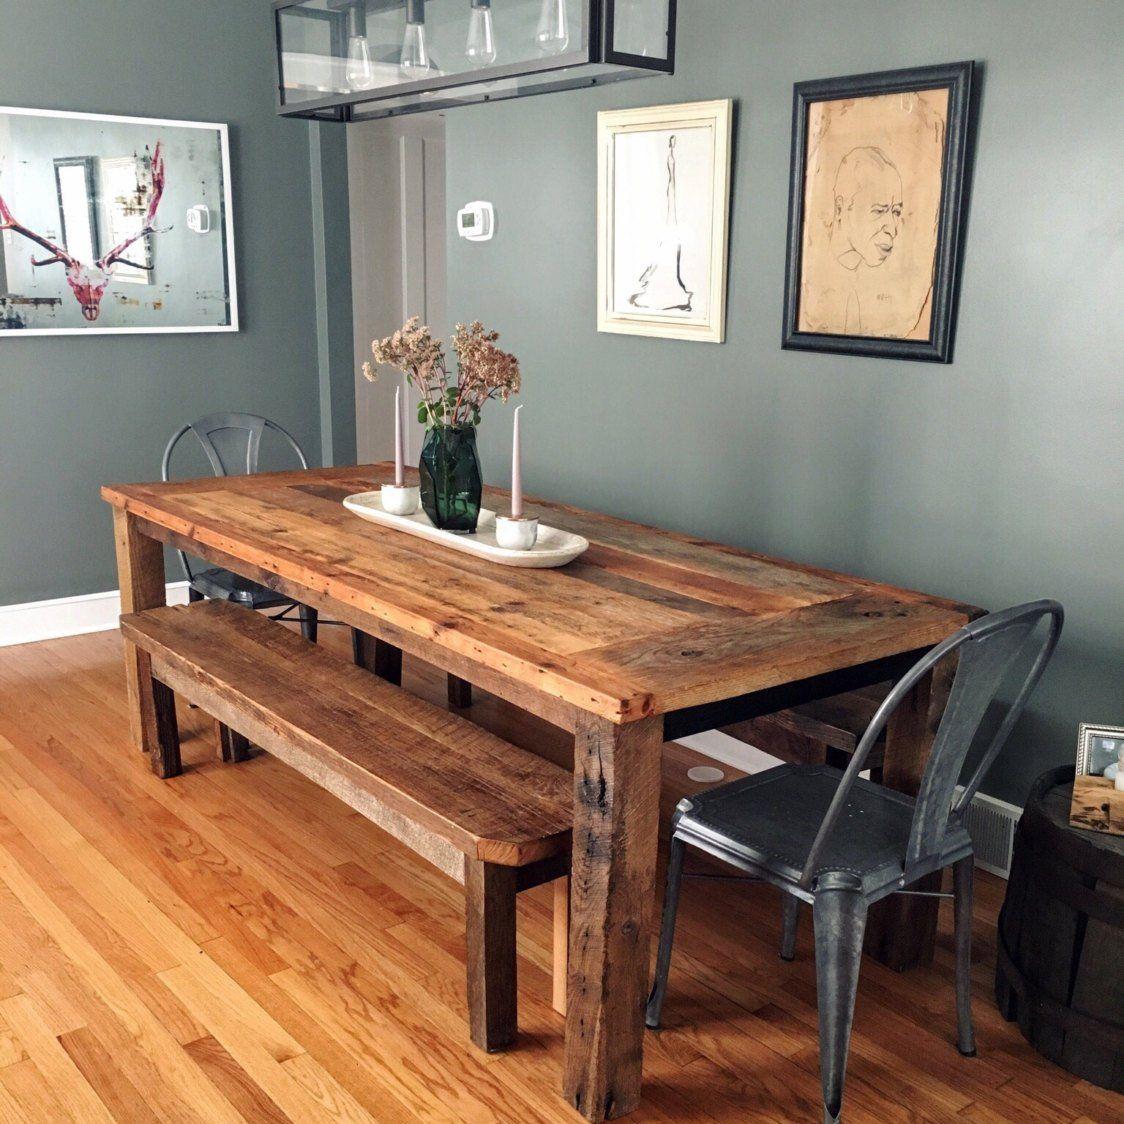 Reclaimed Wood Farmhouse Dining Table #Dine, #Table, #Wood